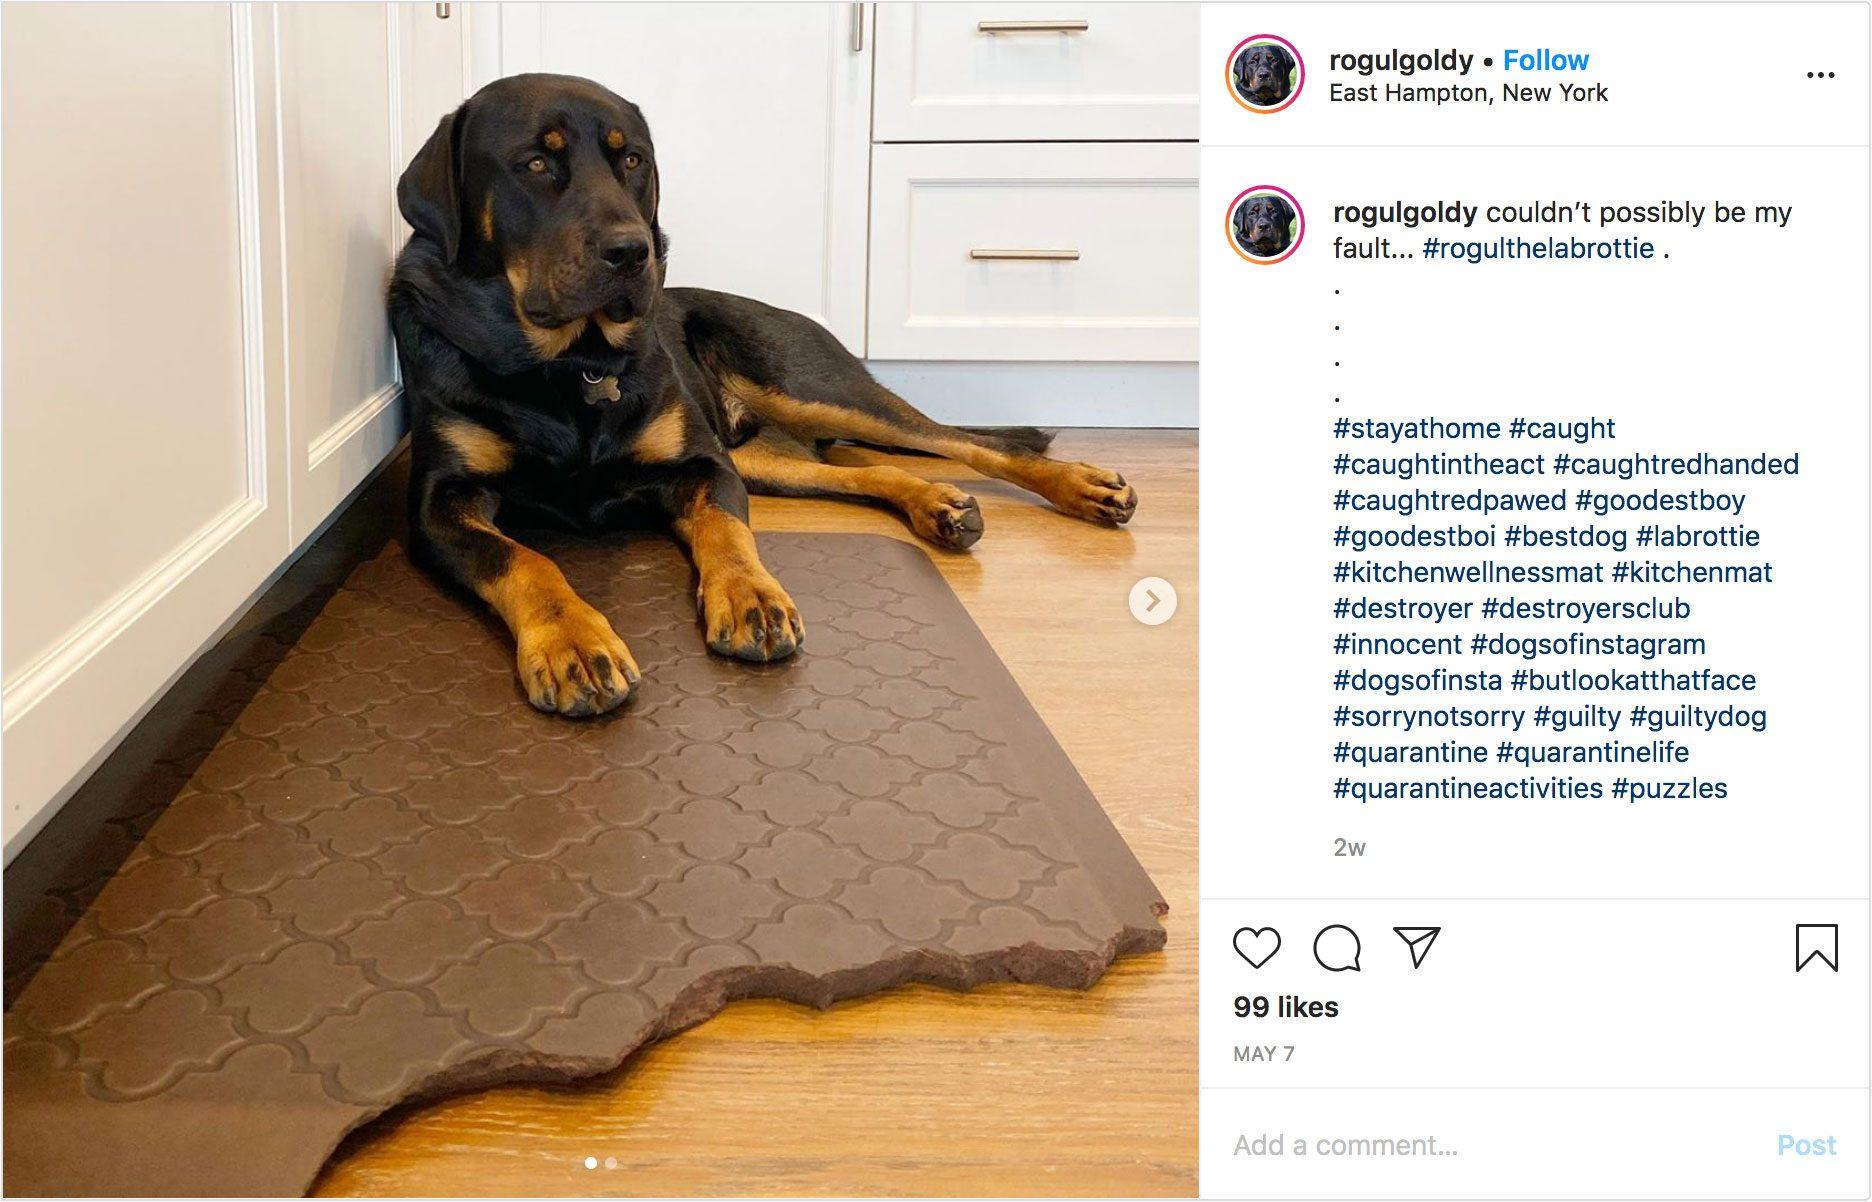 rogulgoldy instagram. guilty dog.